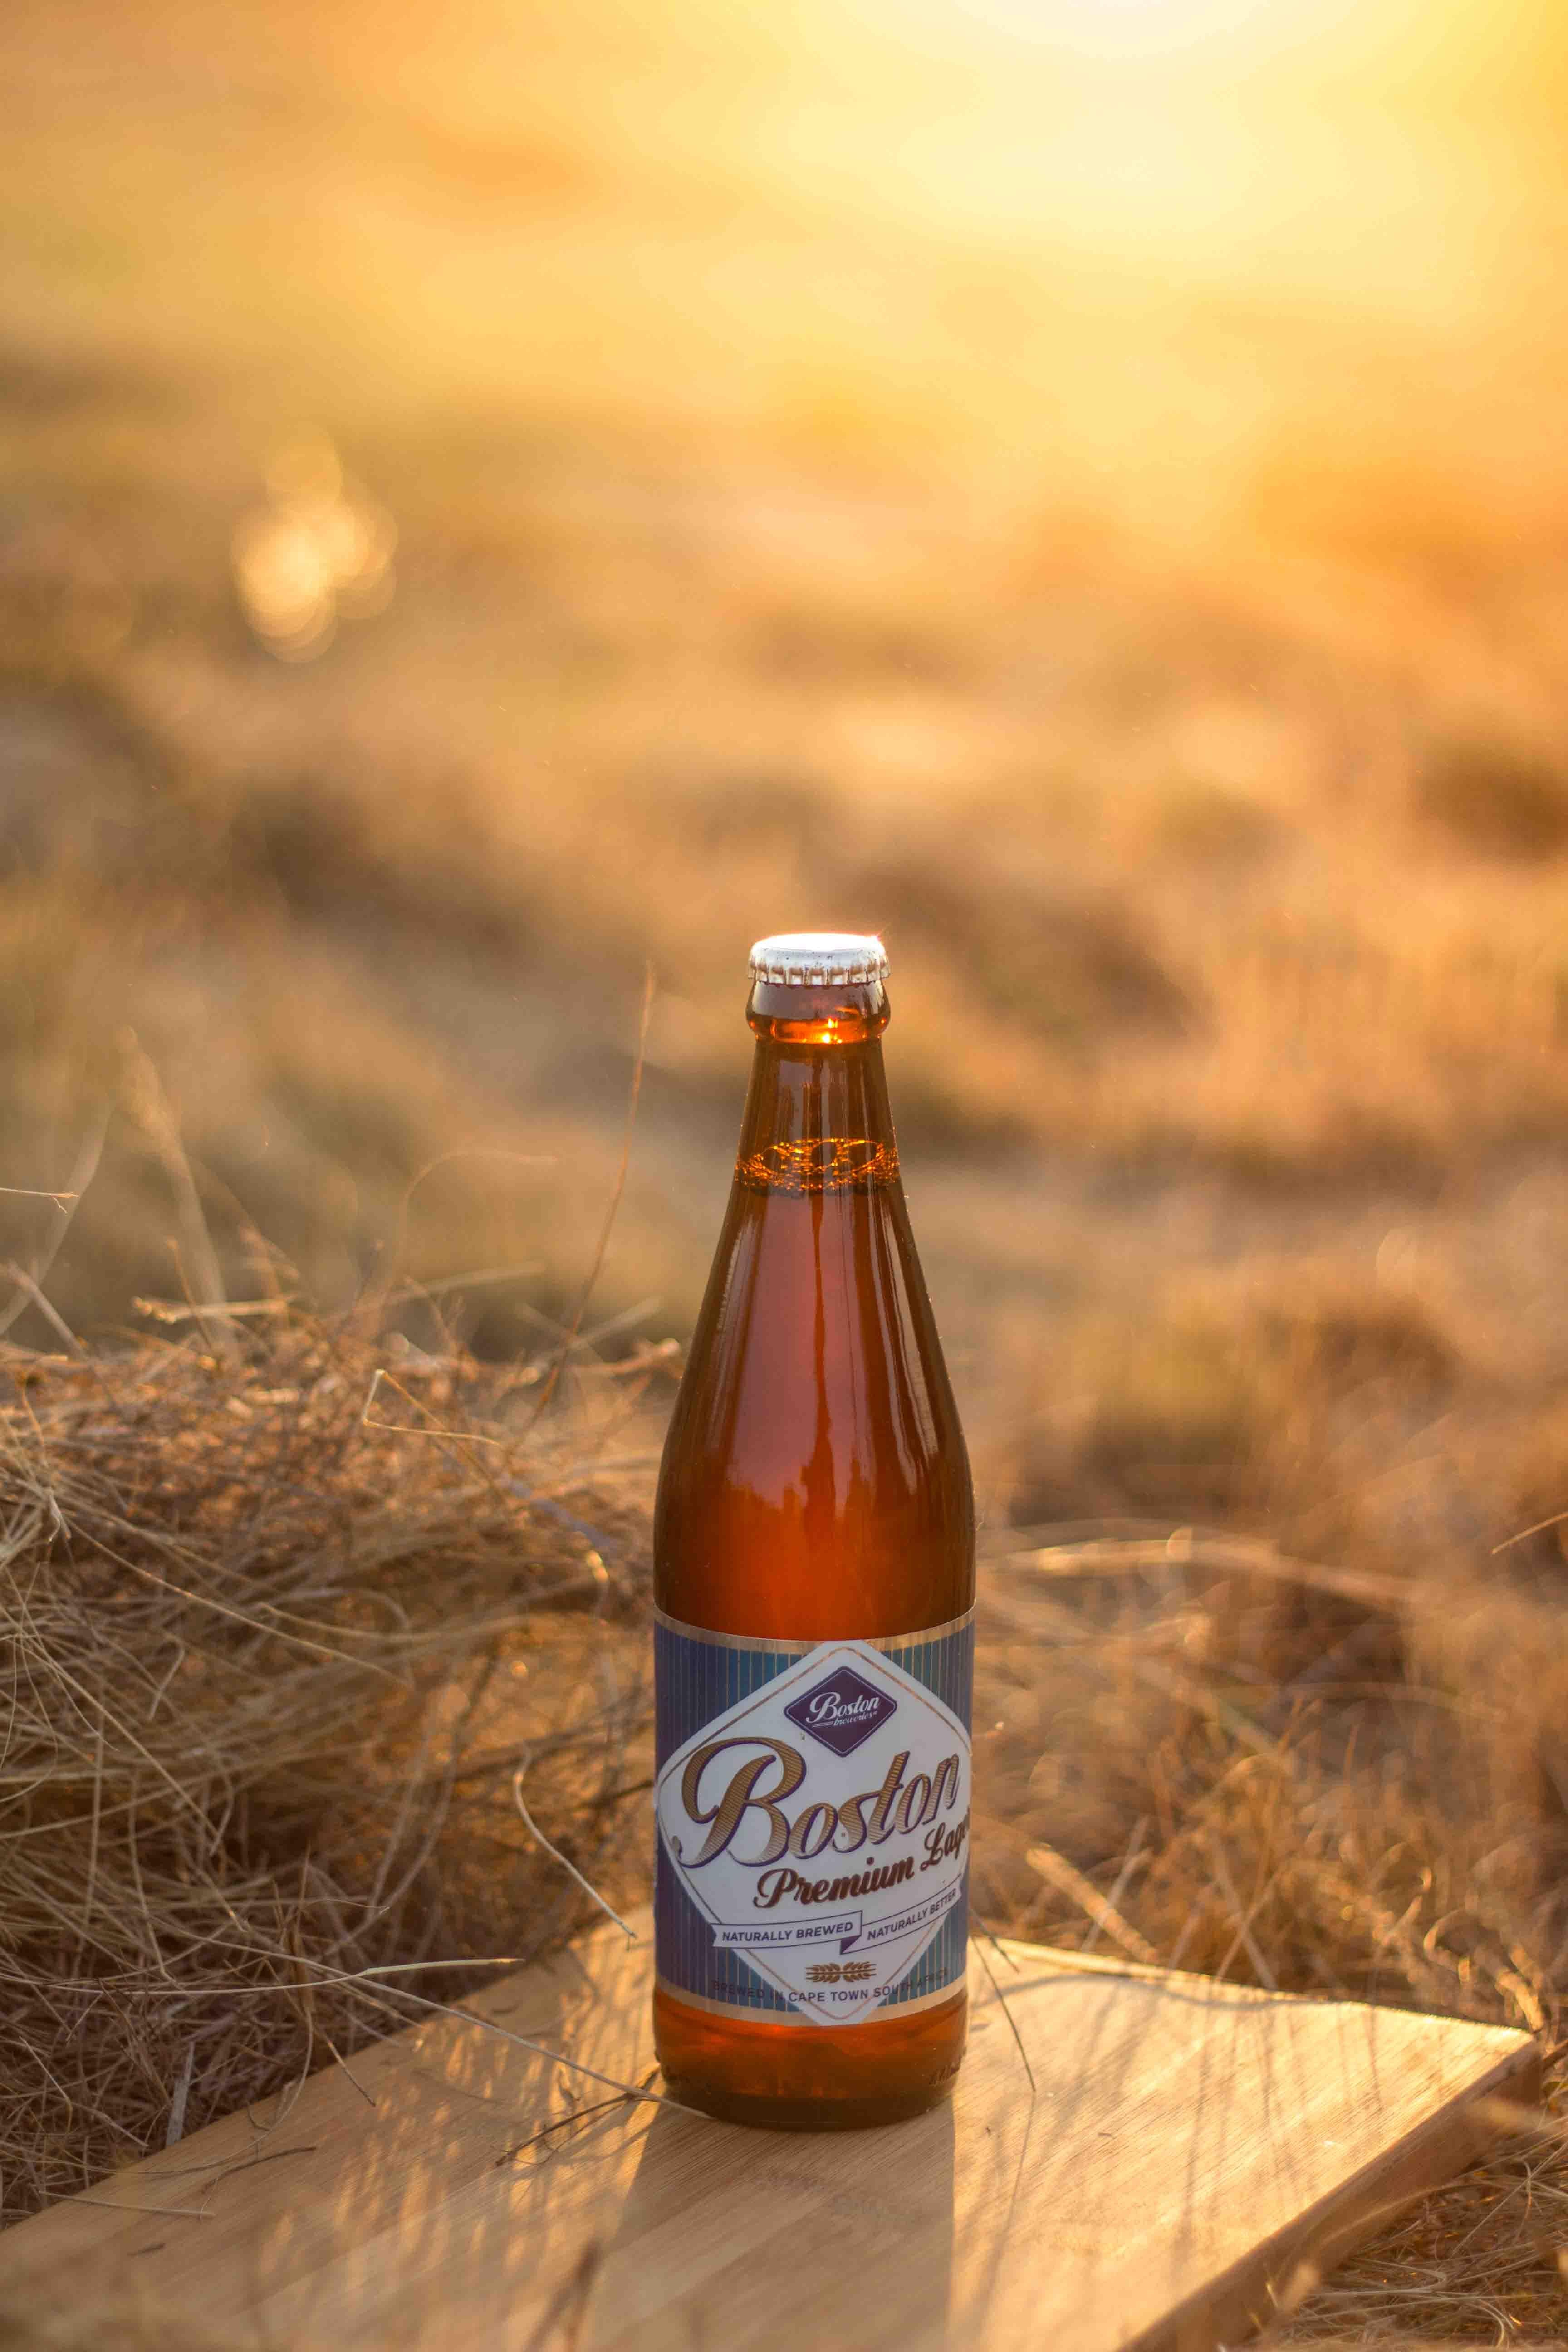 Boston premium bottle